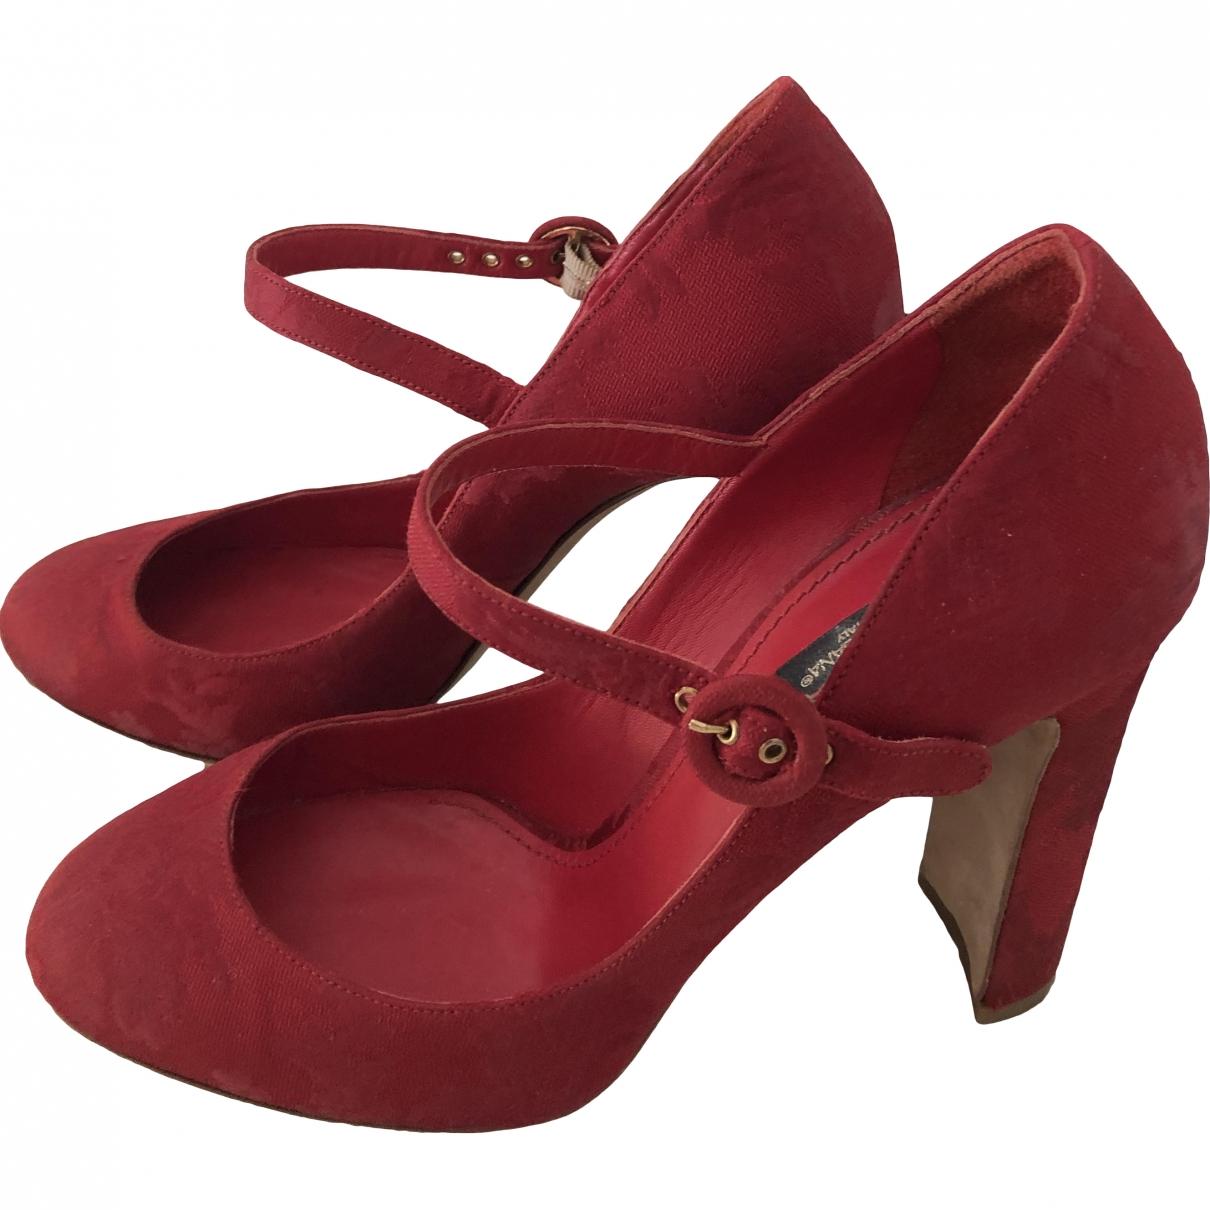 Dolce & Gabbana \N Red Suede Heels for Women 40 EU